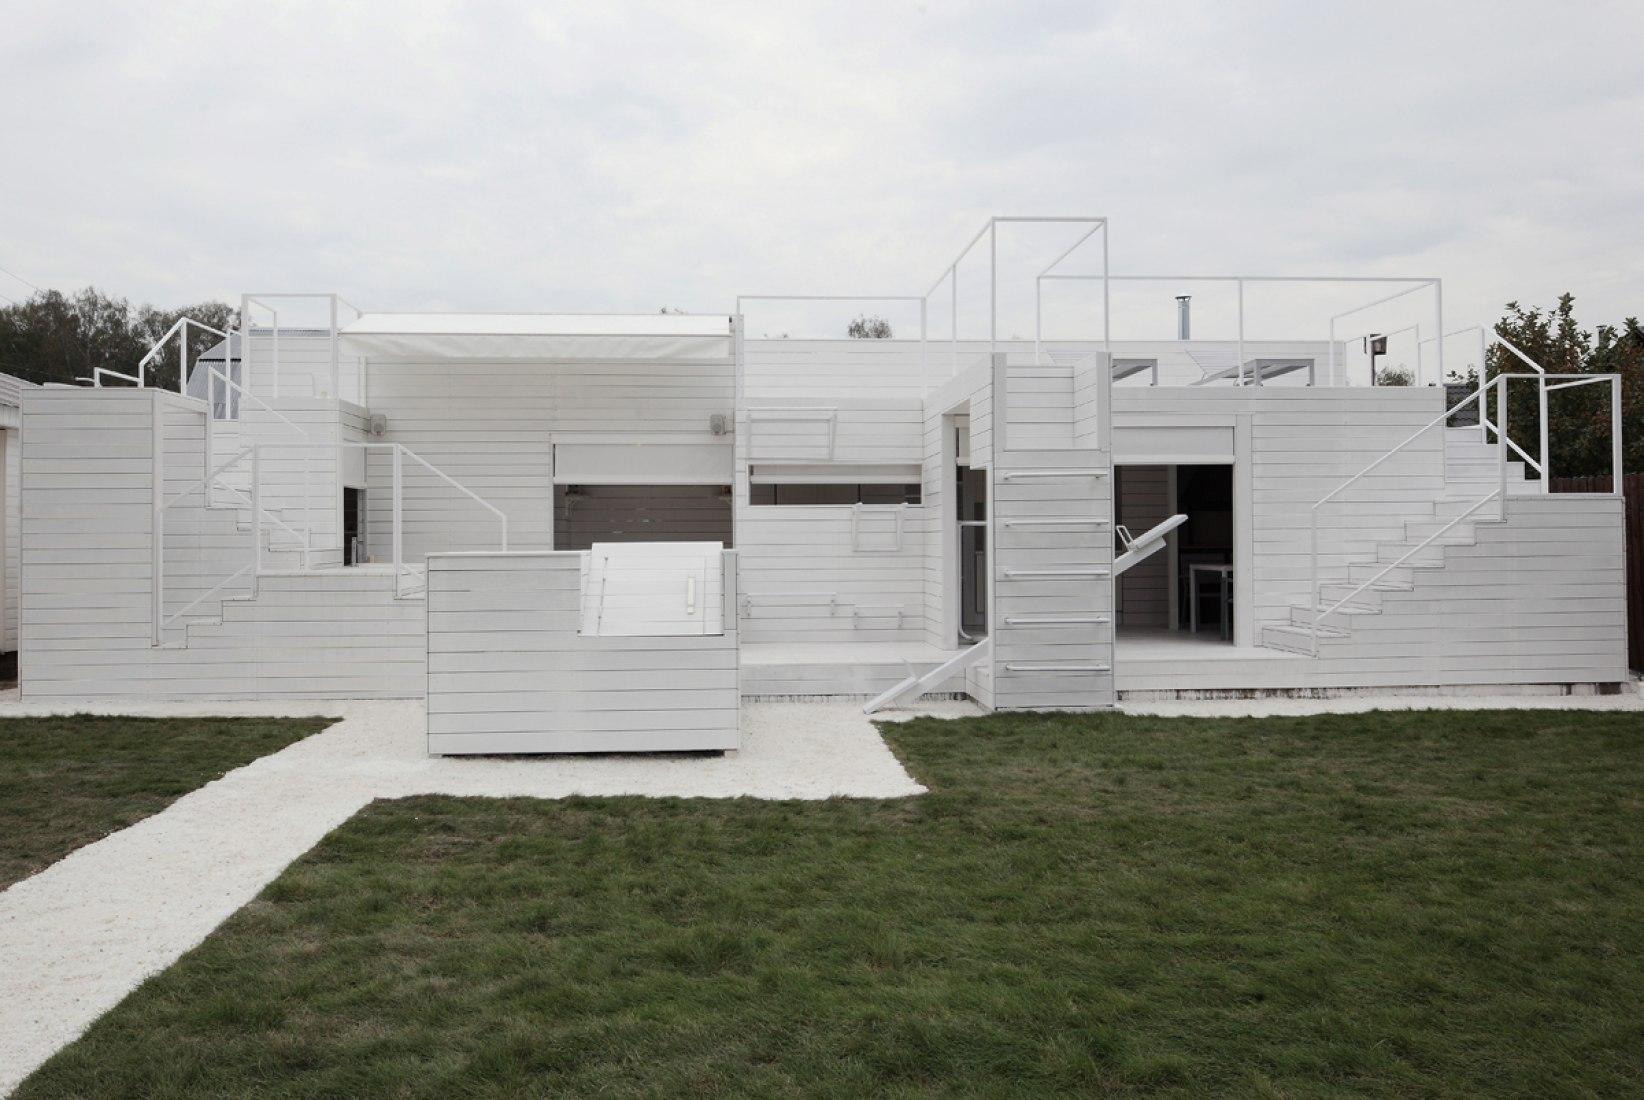 Casa Origami por Peter Kostelov. Fotografía © Zinon Razutdinov.